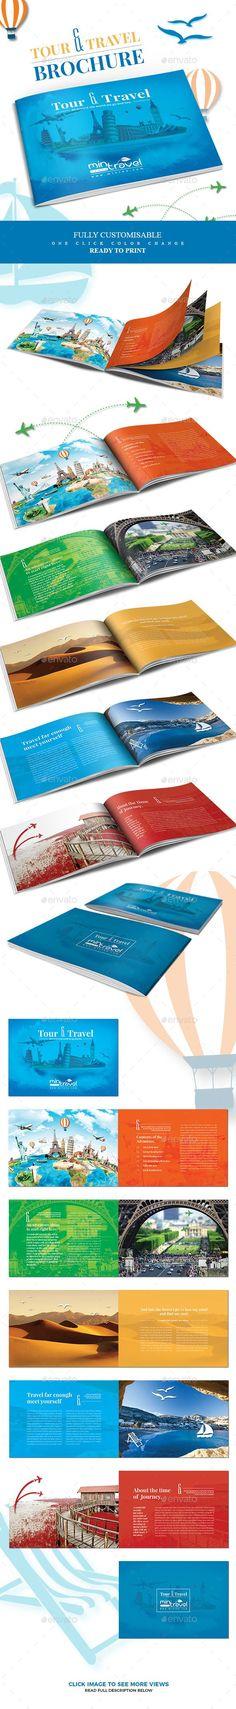 Tour and Tourism Brochure - #Informational #Brochures